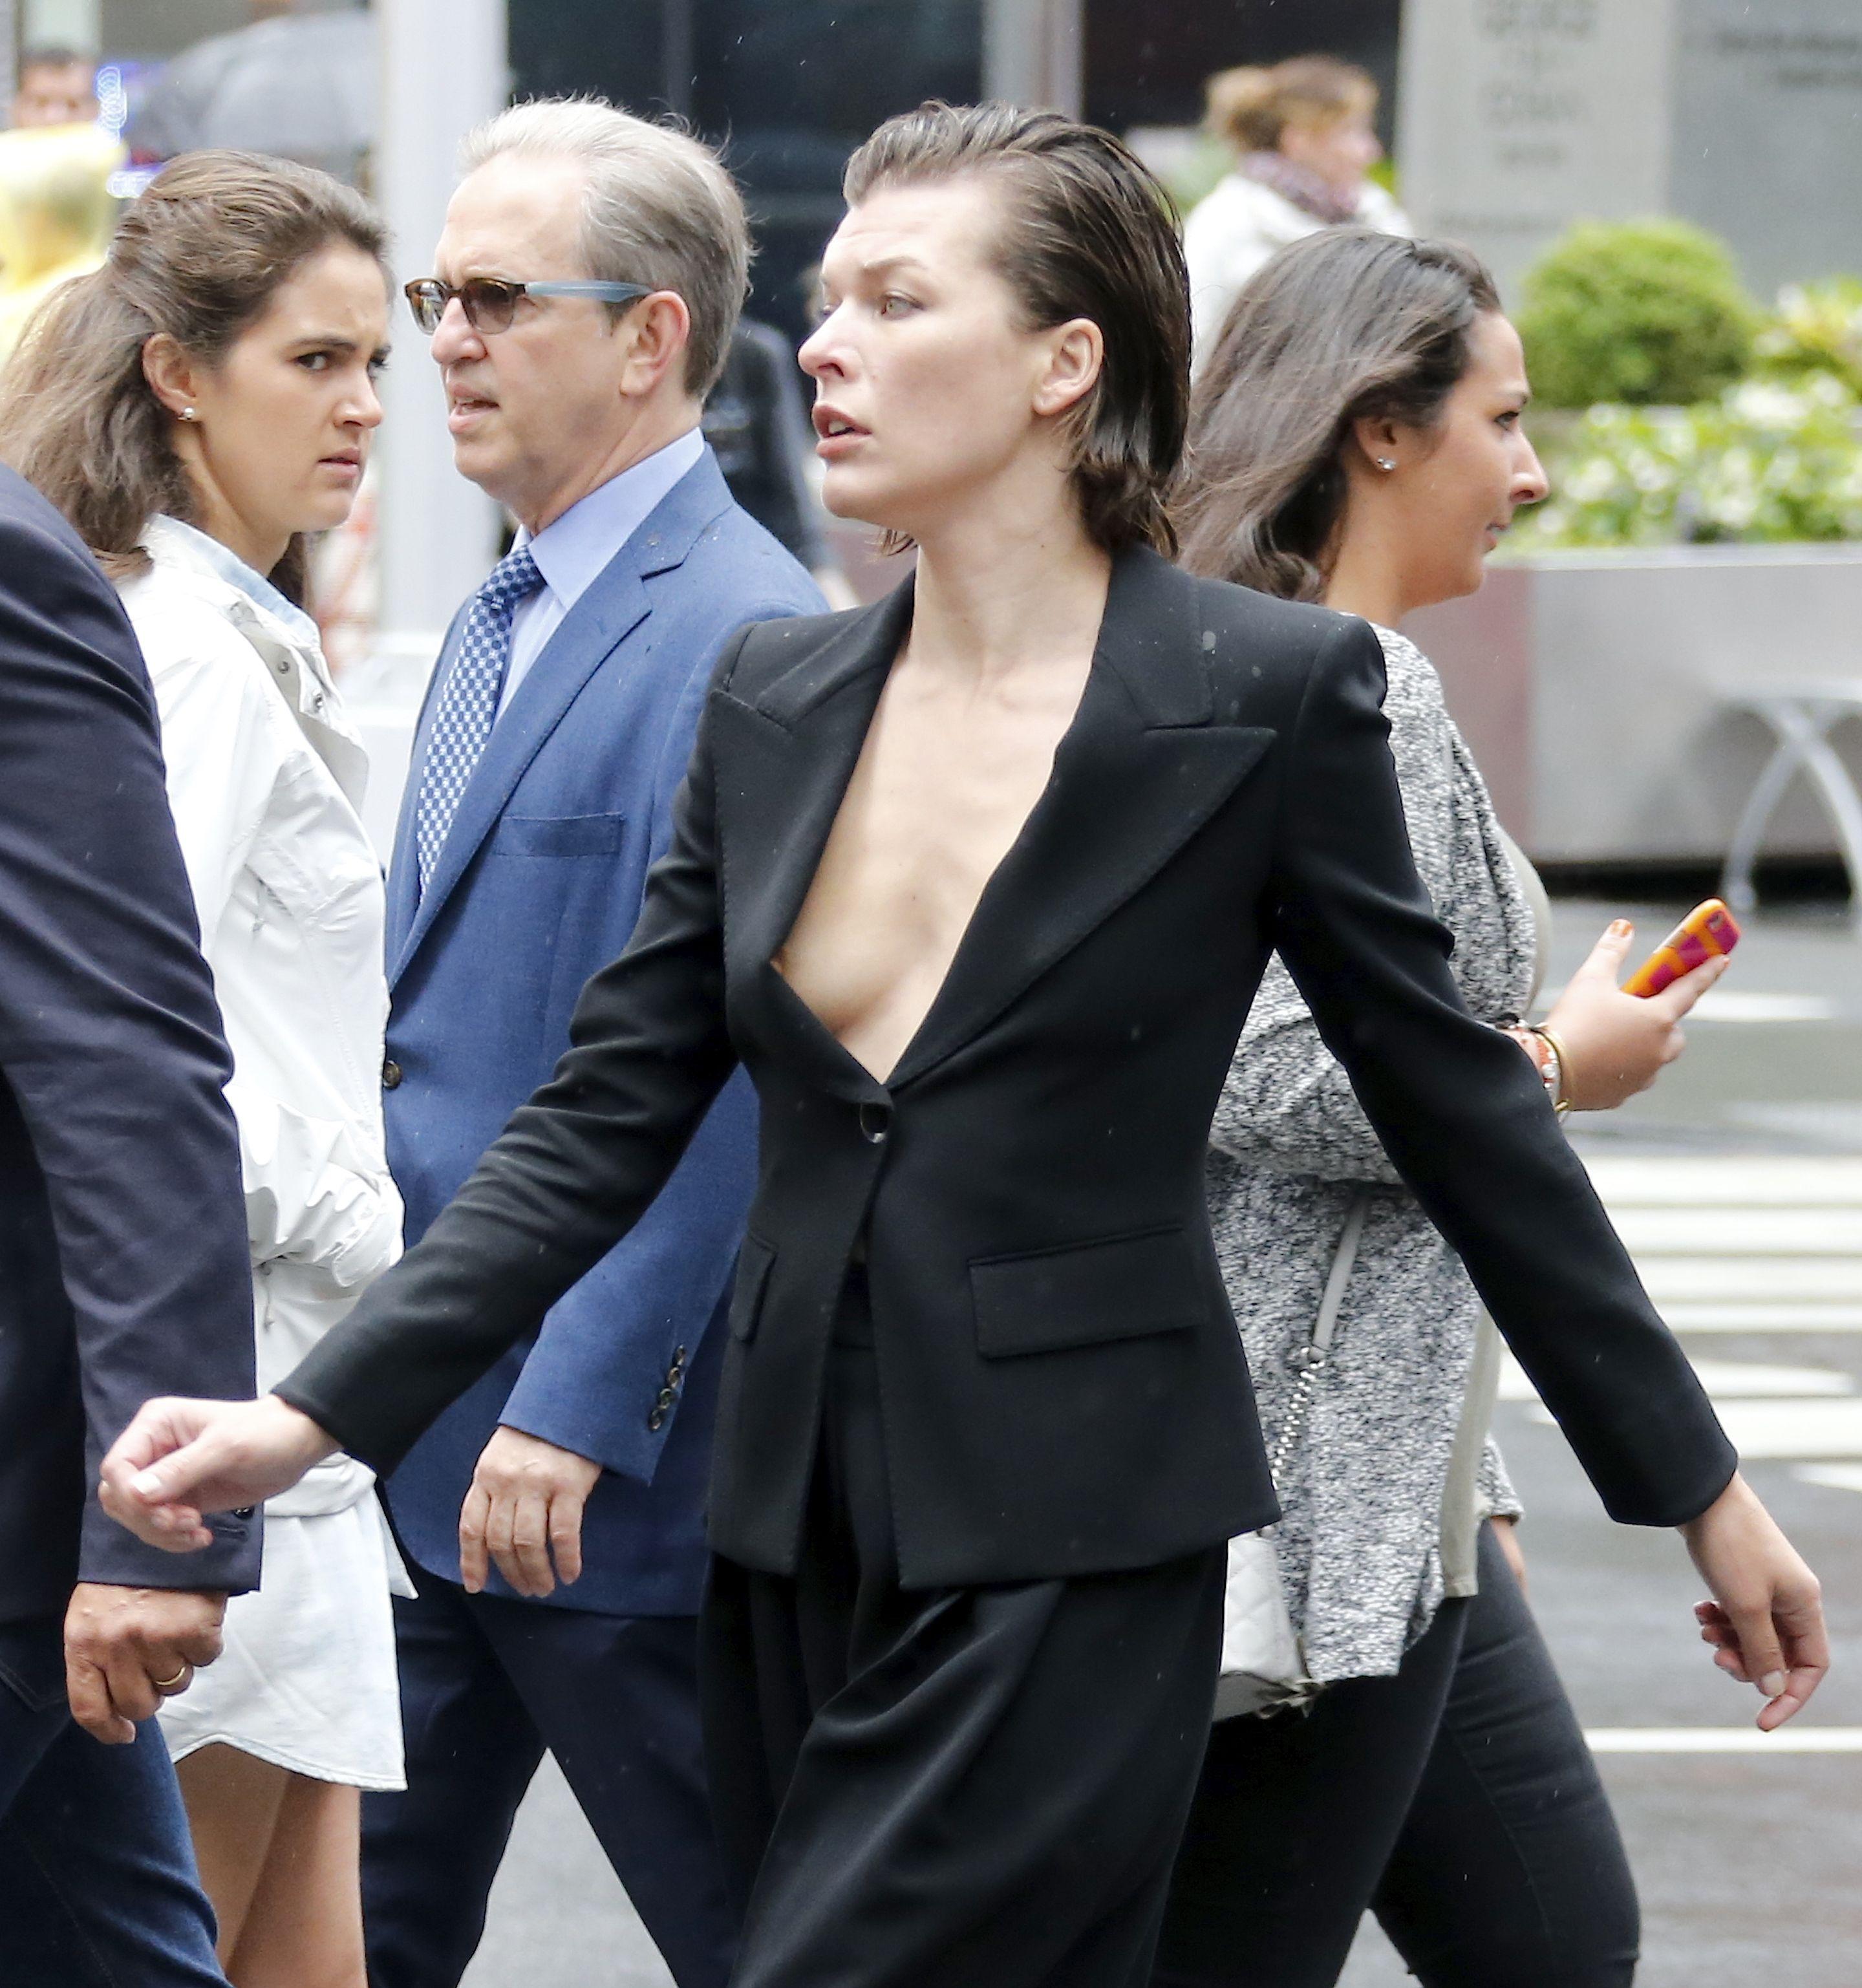 Milla-Jovovich-Nip-Slip-5